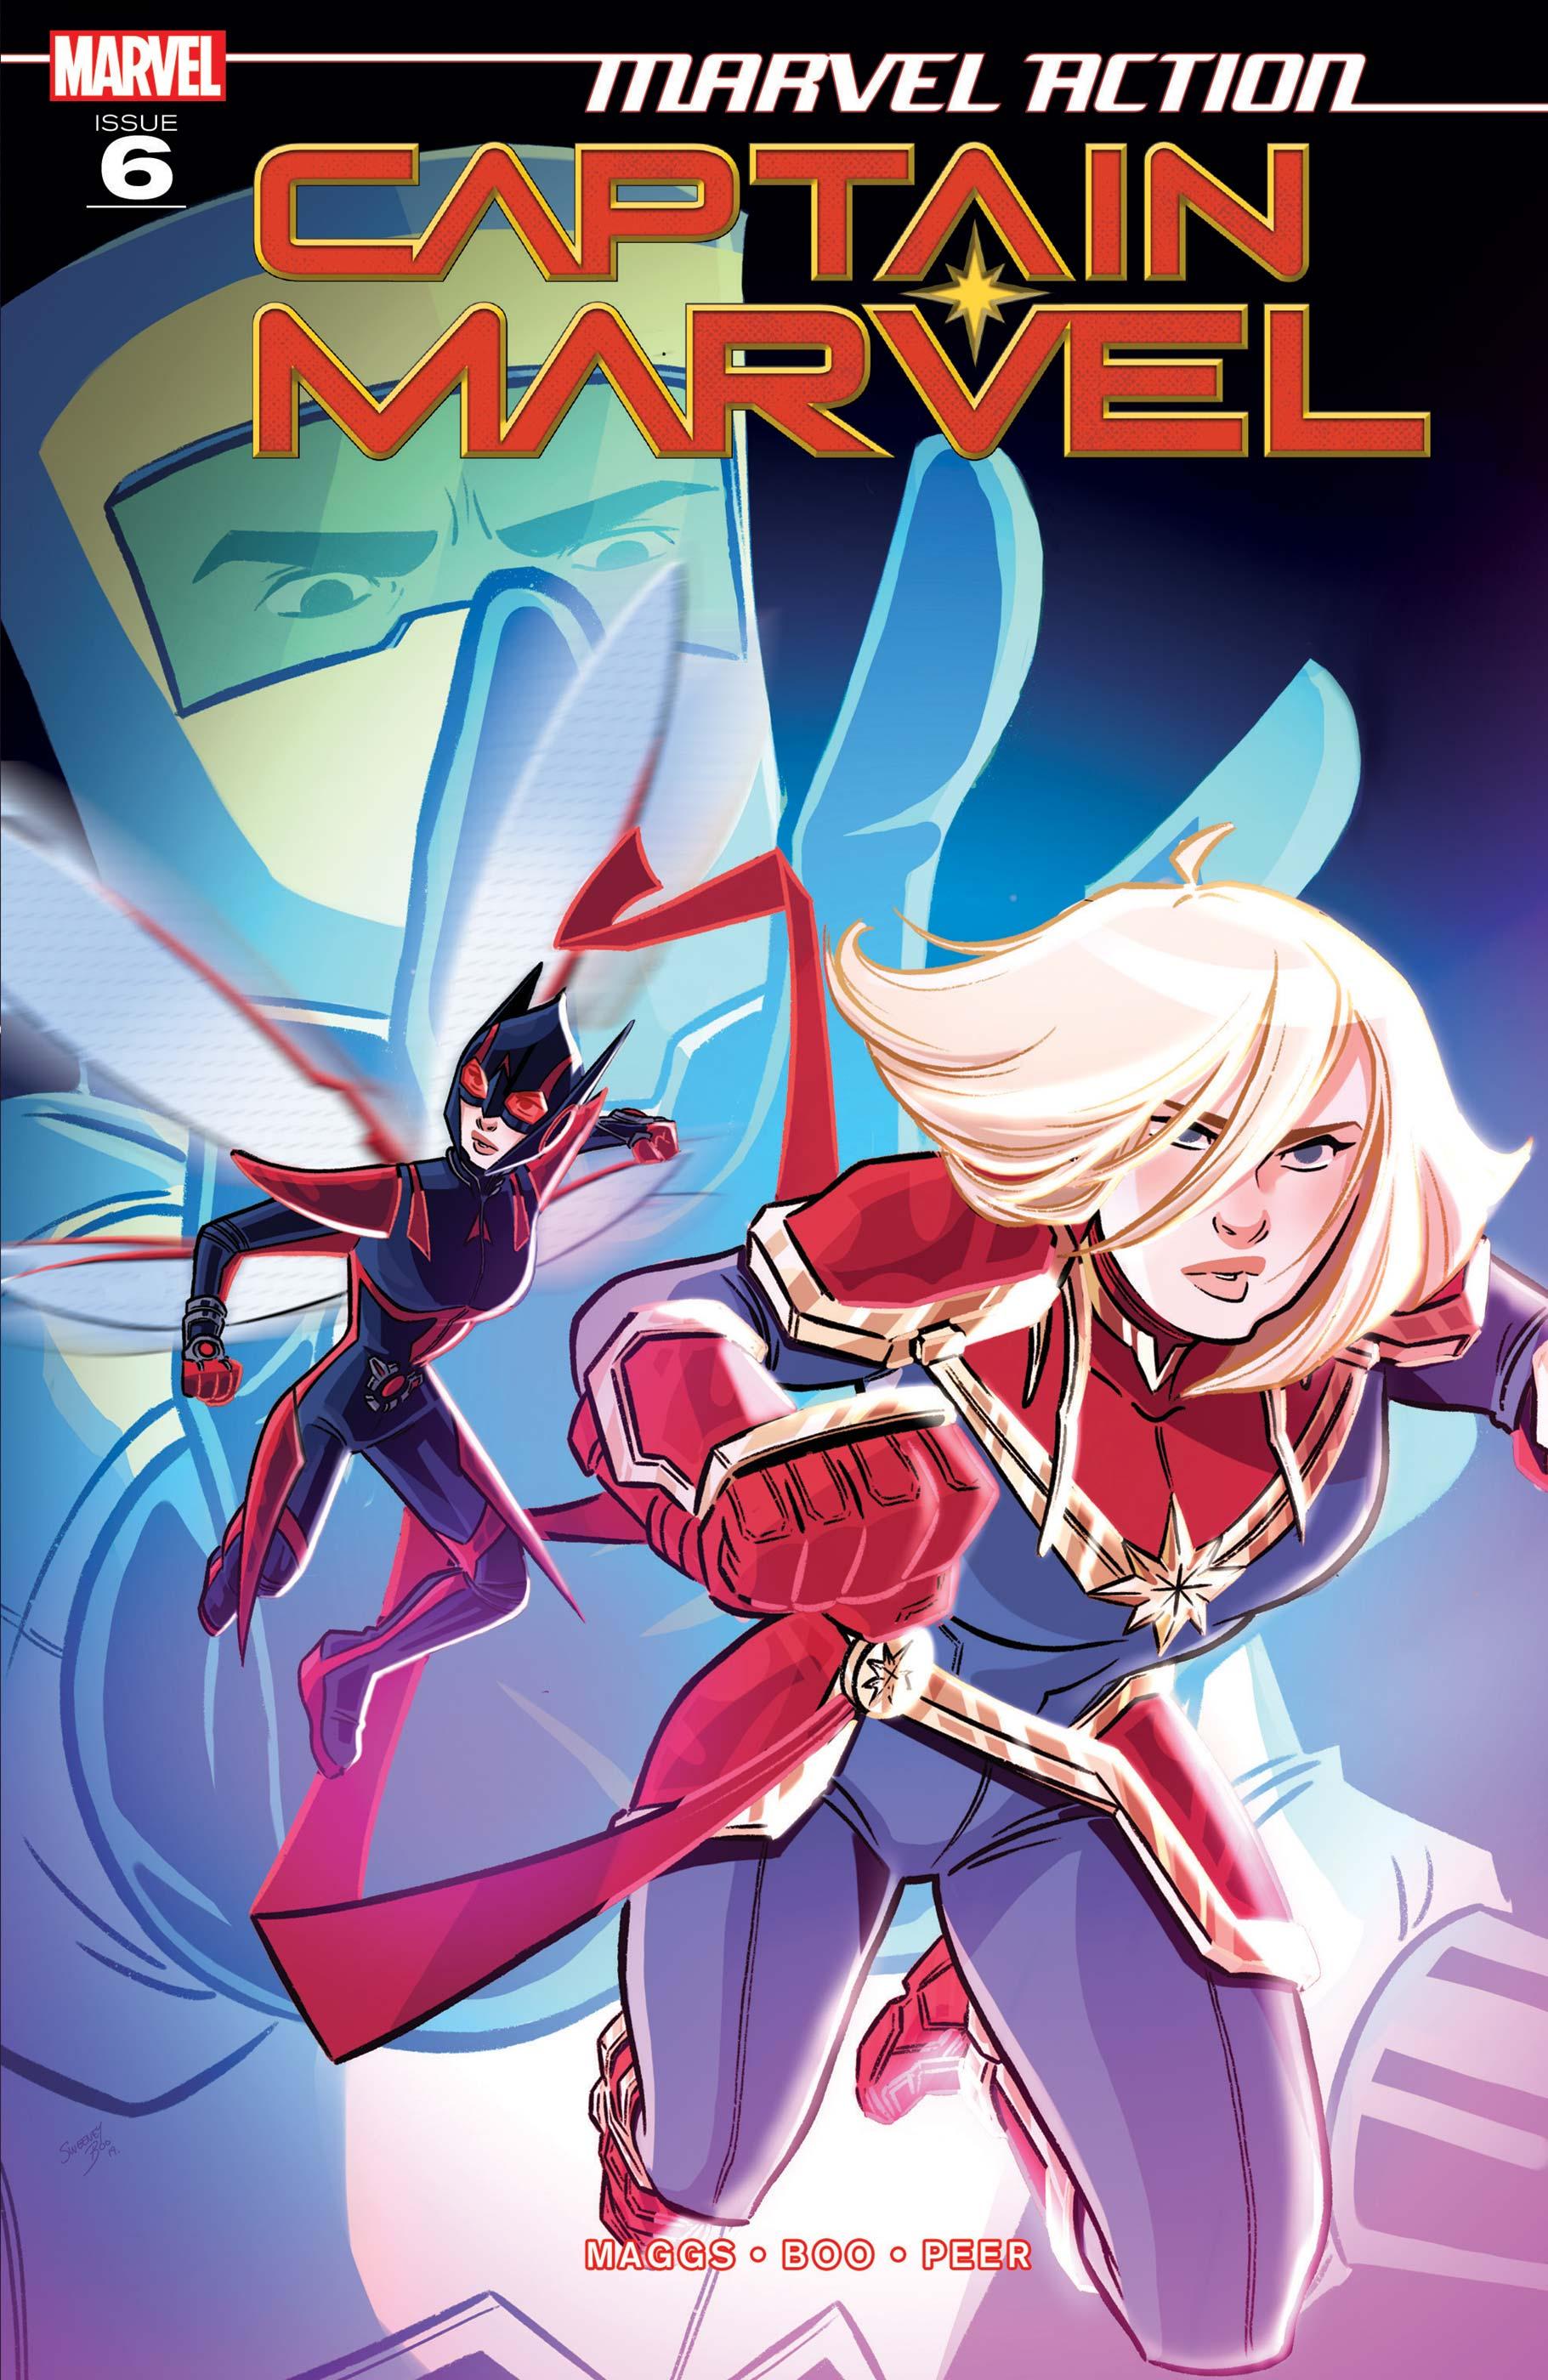 Marvel Action Captain Marvel (2019) #6